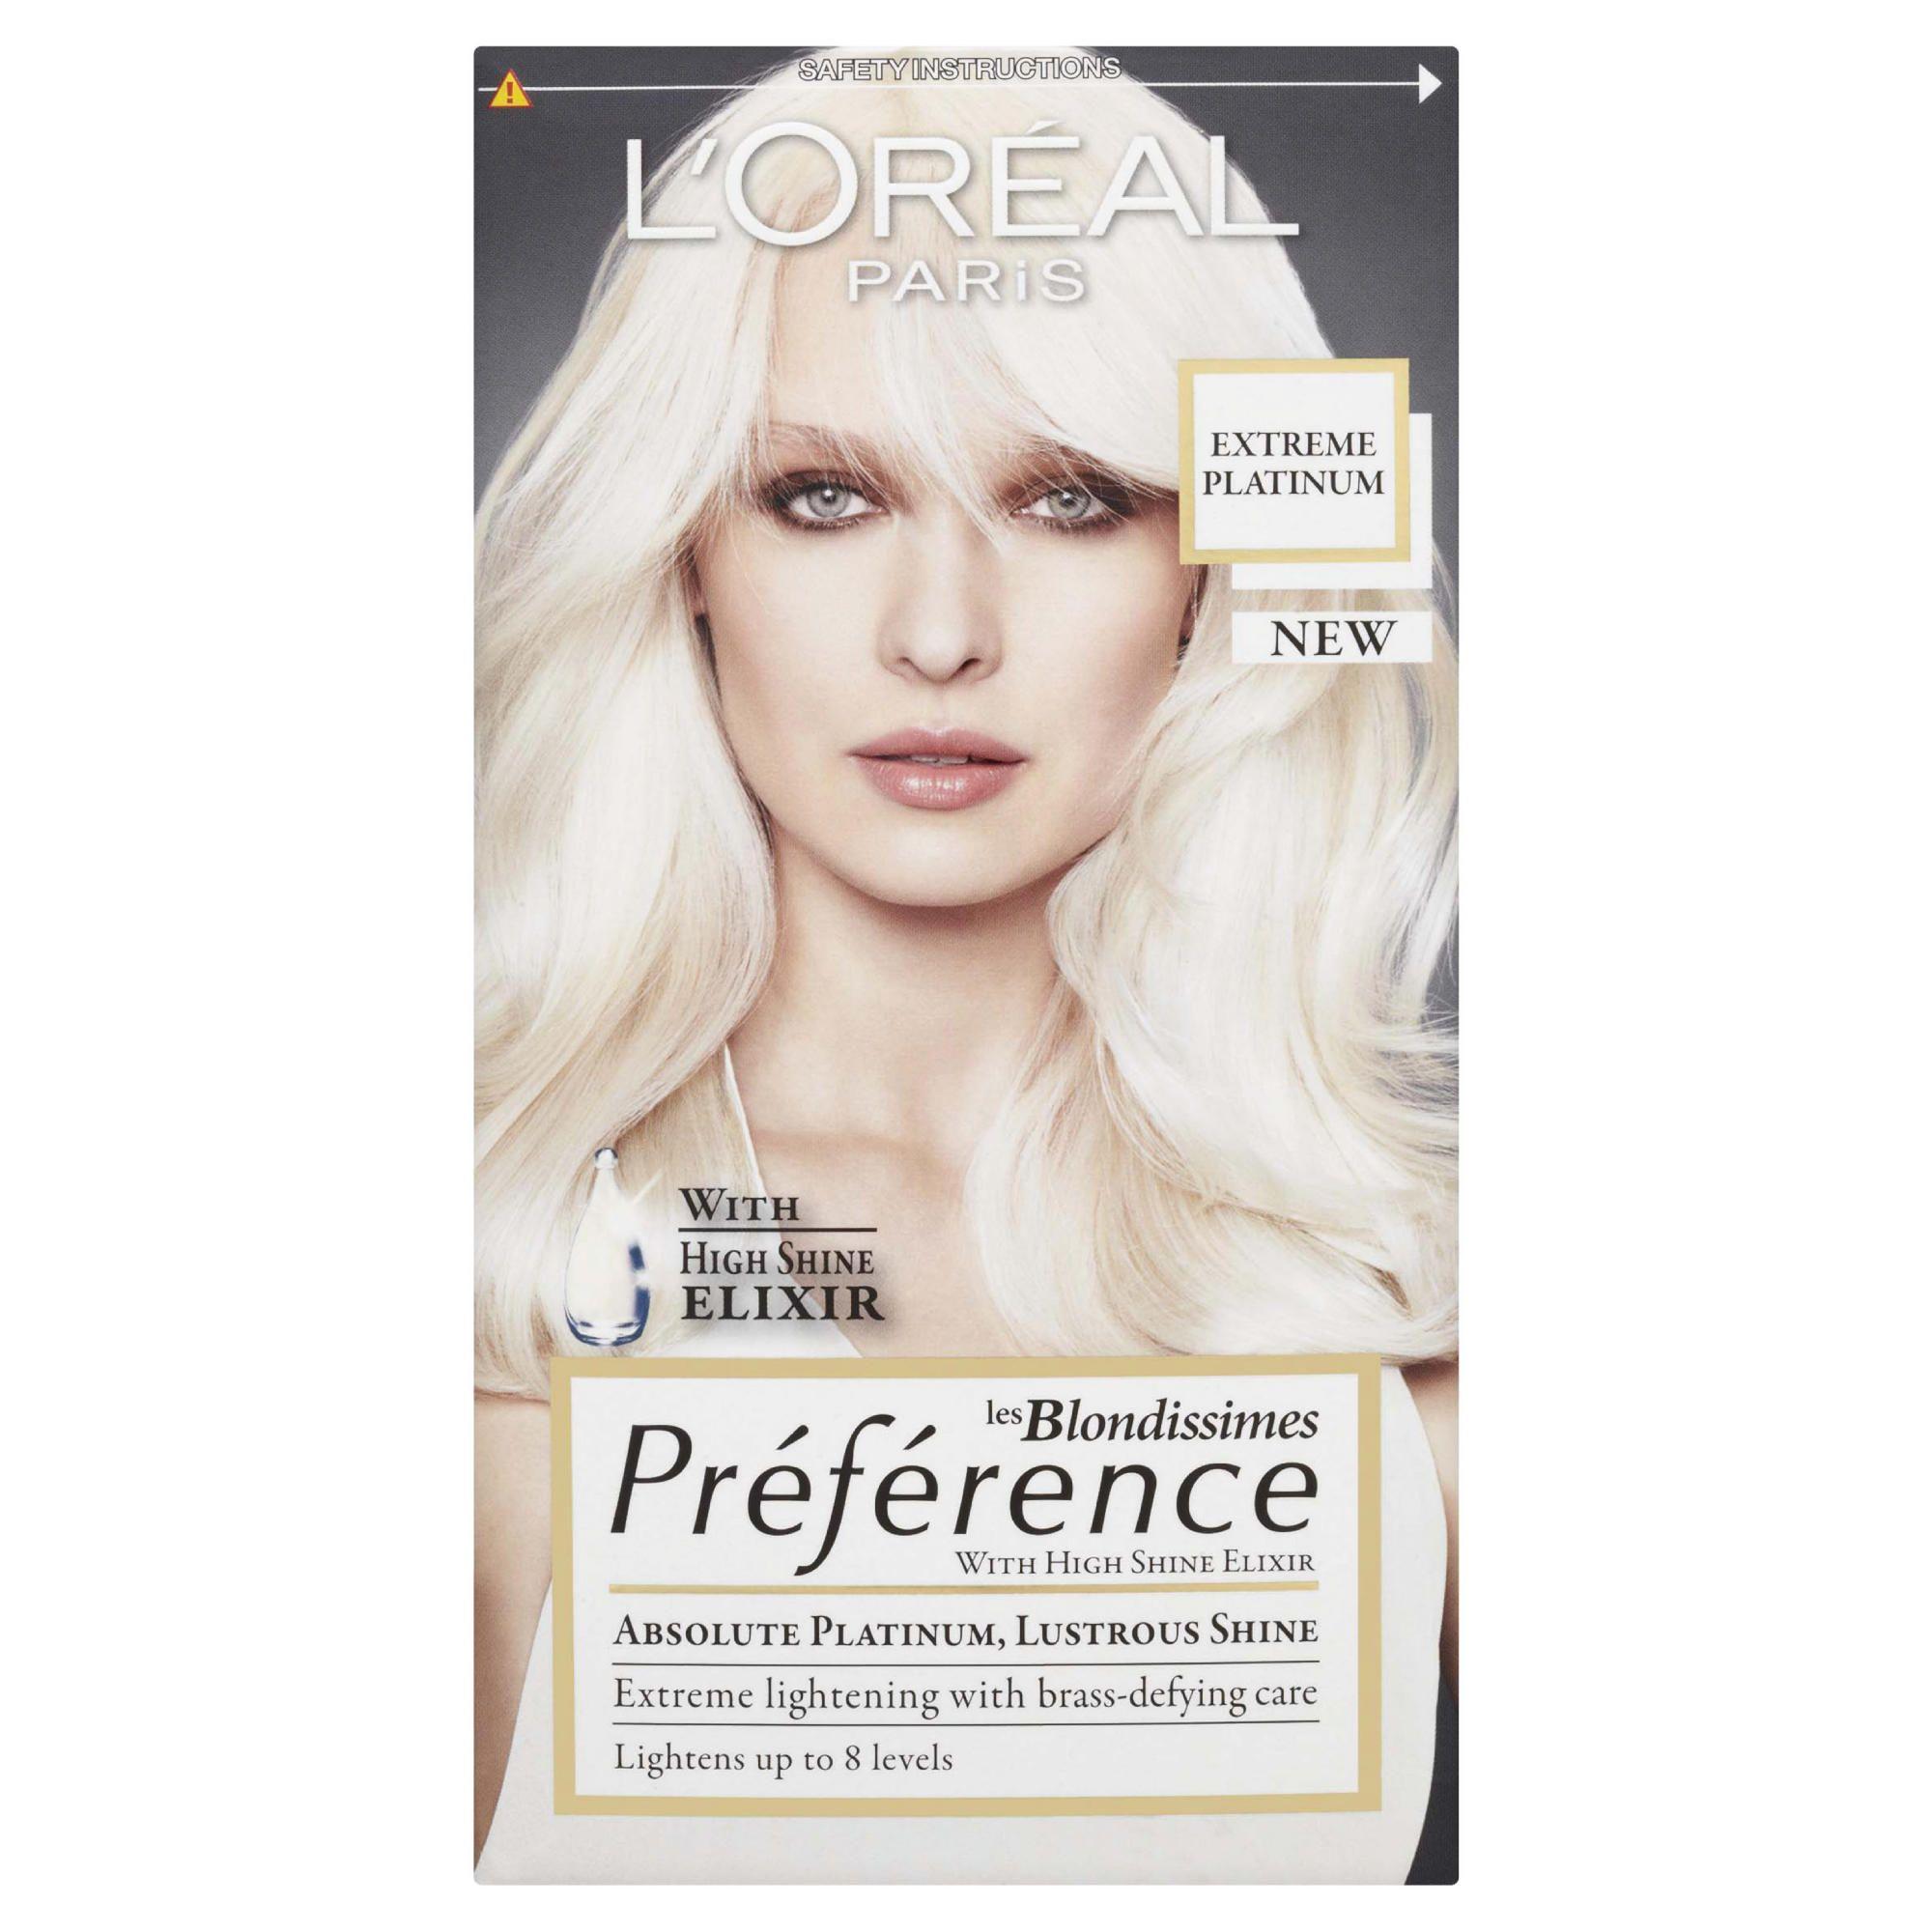 L'Oreal Preference Platinum Extreme Platinum Blonde 8L